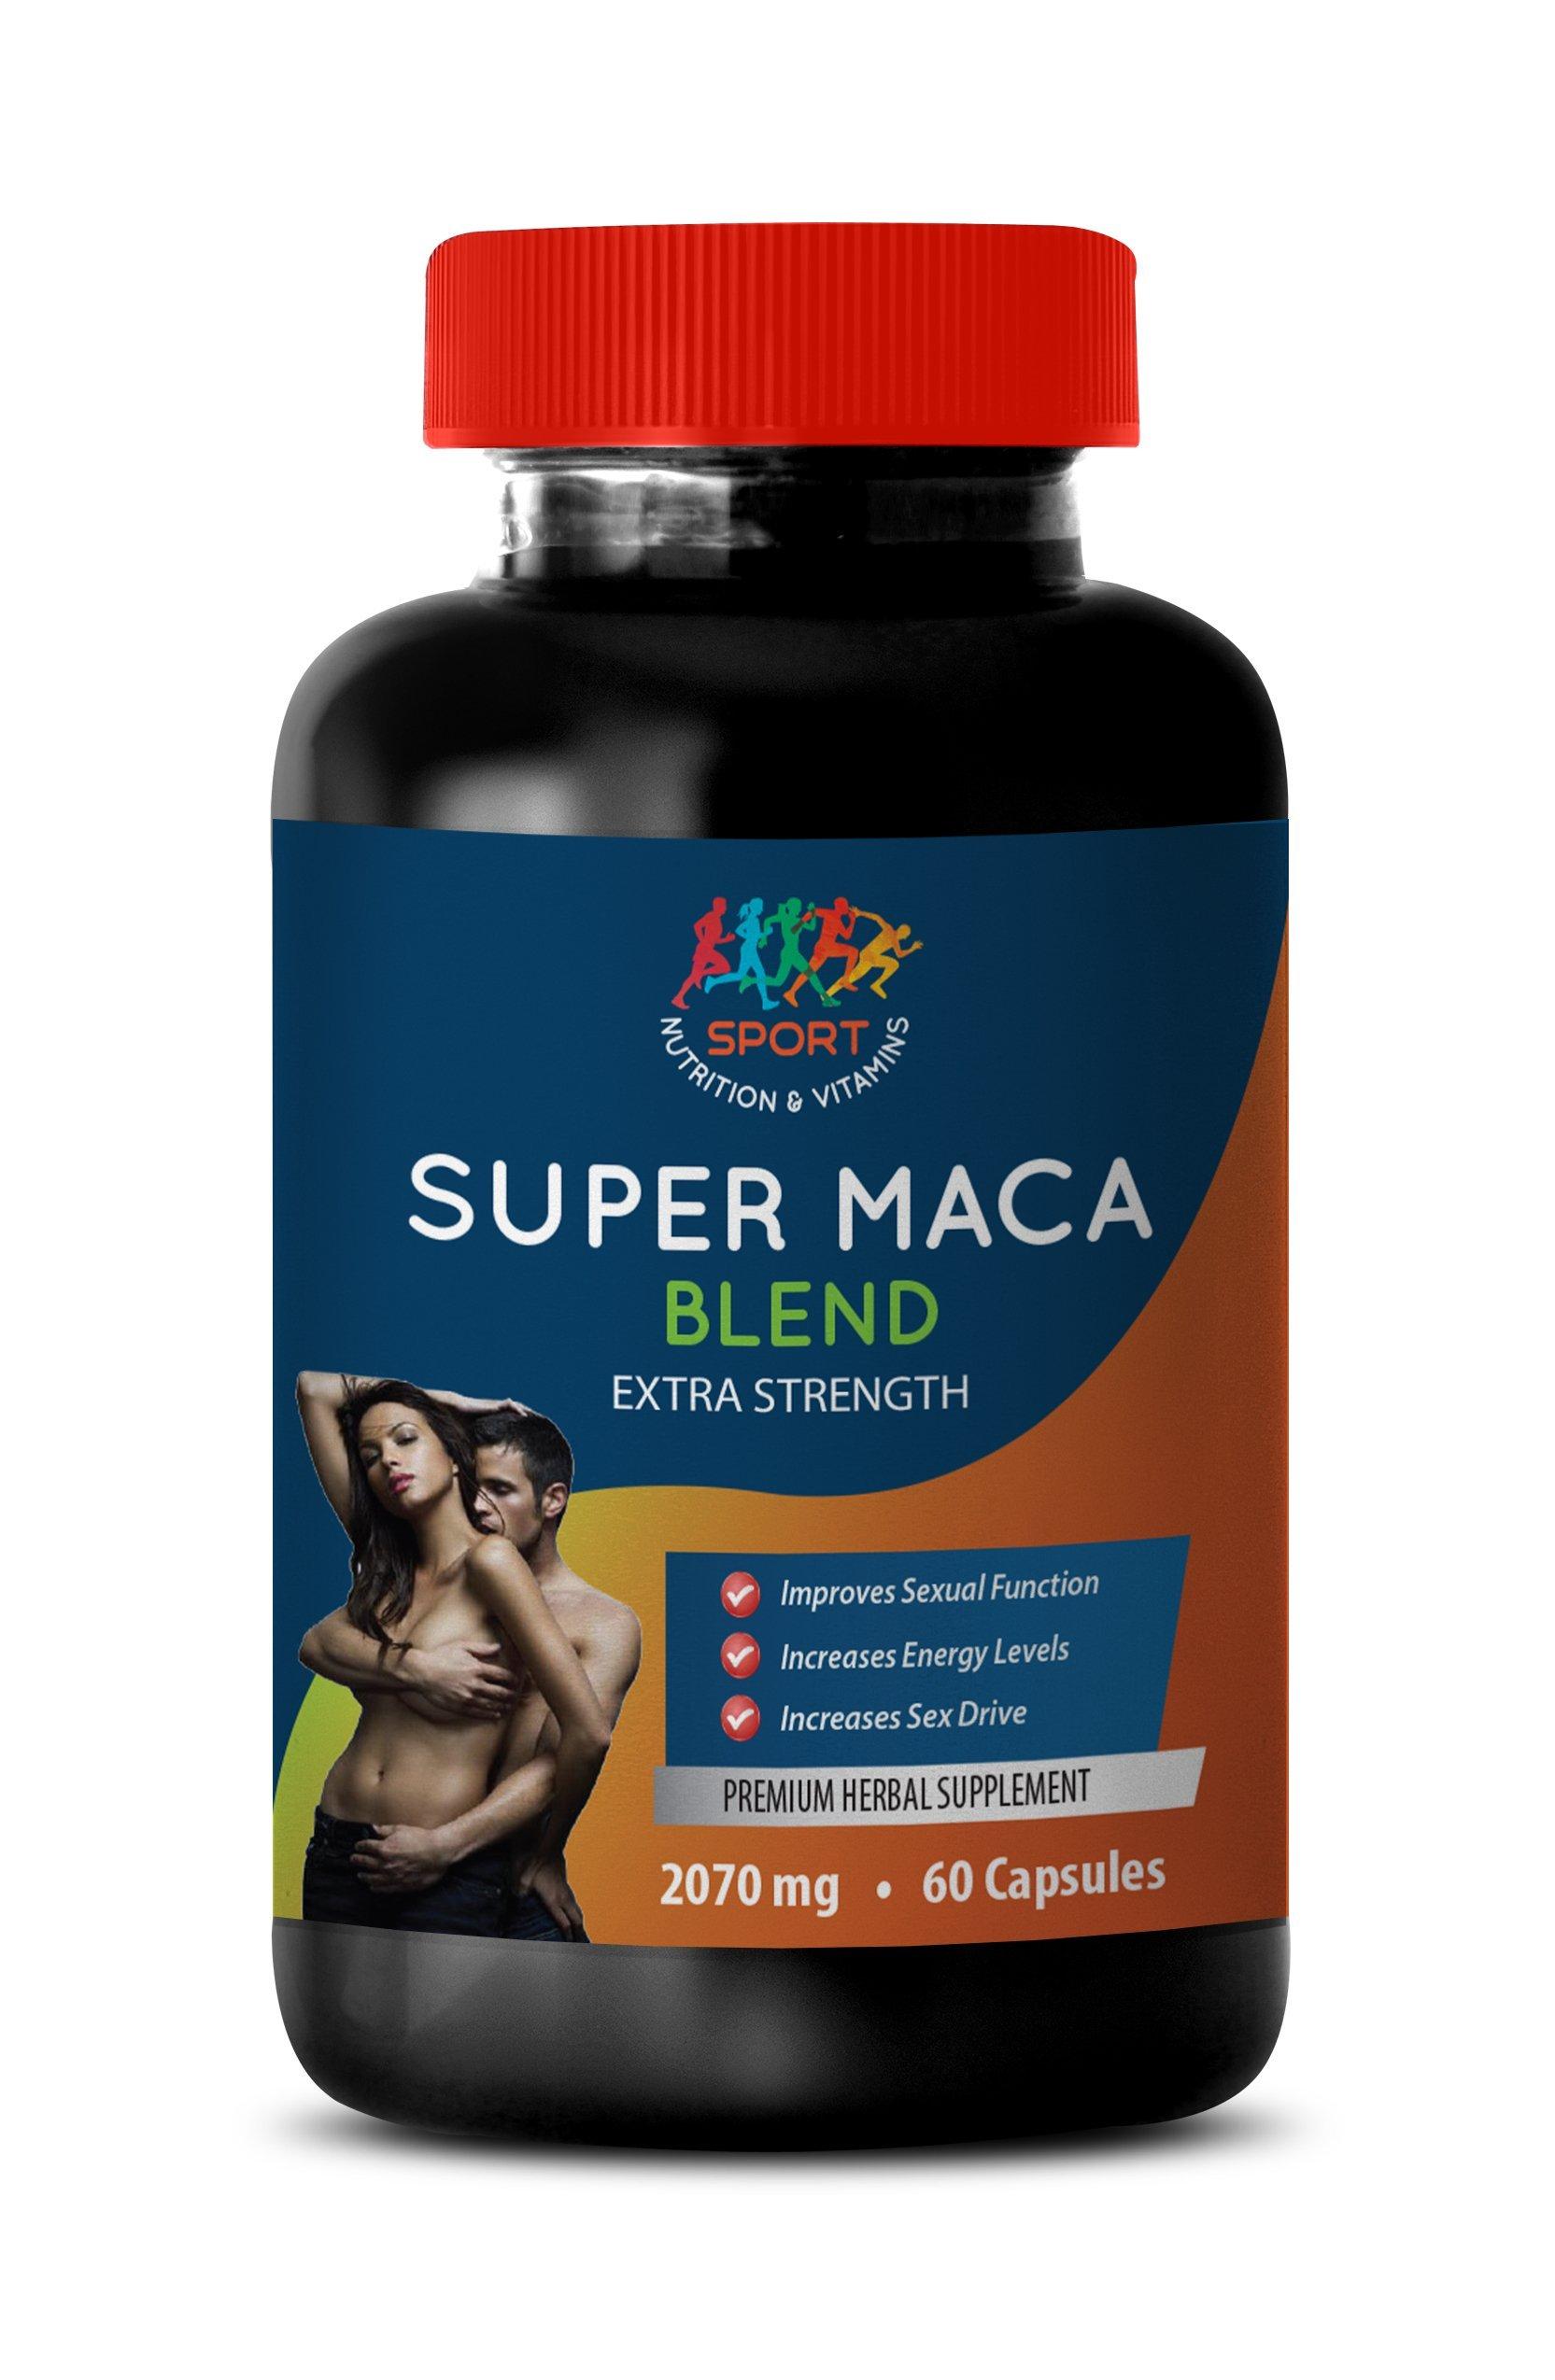 Male Enhancing Pills yohimbe - Super MACA Blend 2070 MG - Extra Strength - maca Extract Bulk Supplements - 1 Bottle 60 Capsules